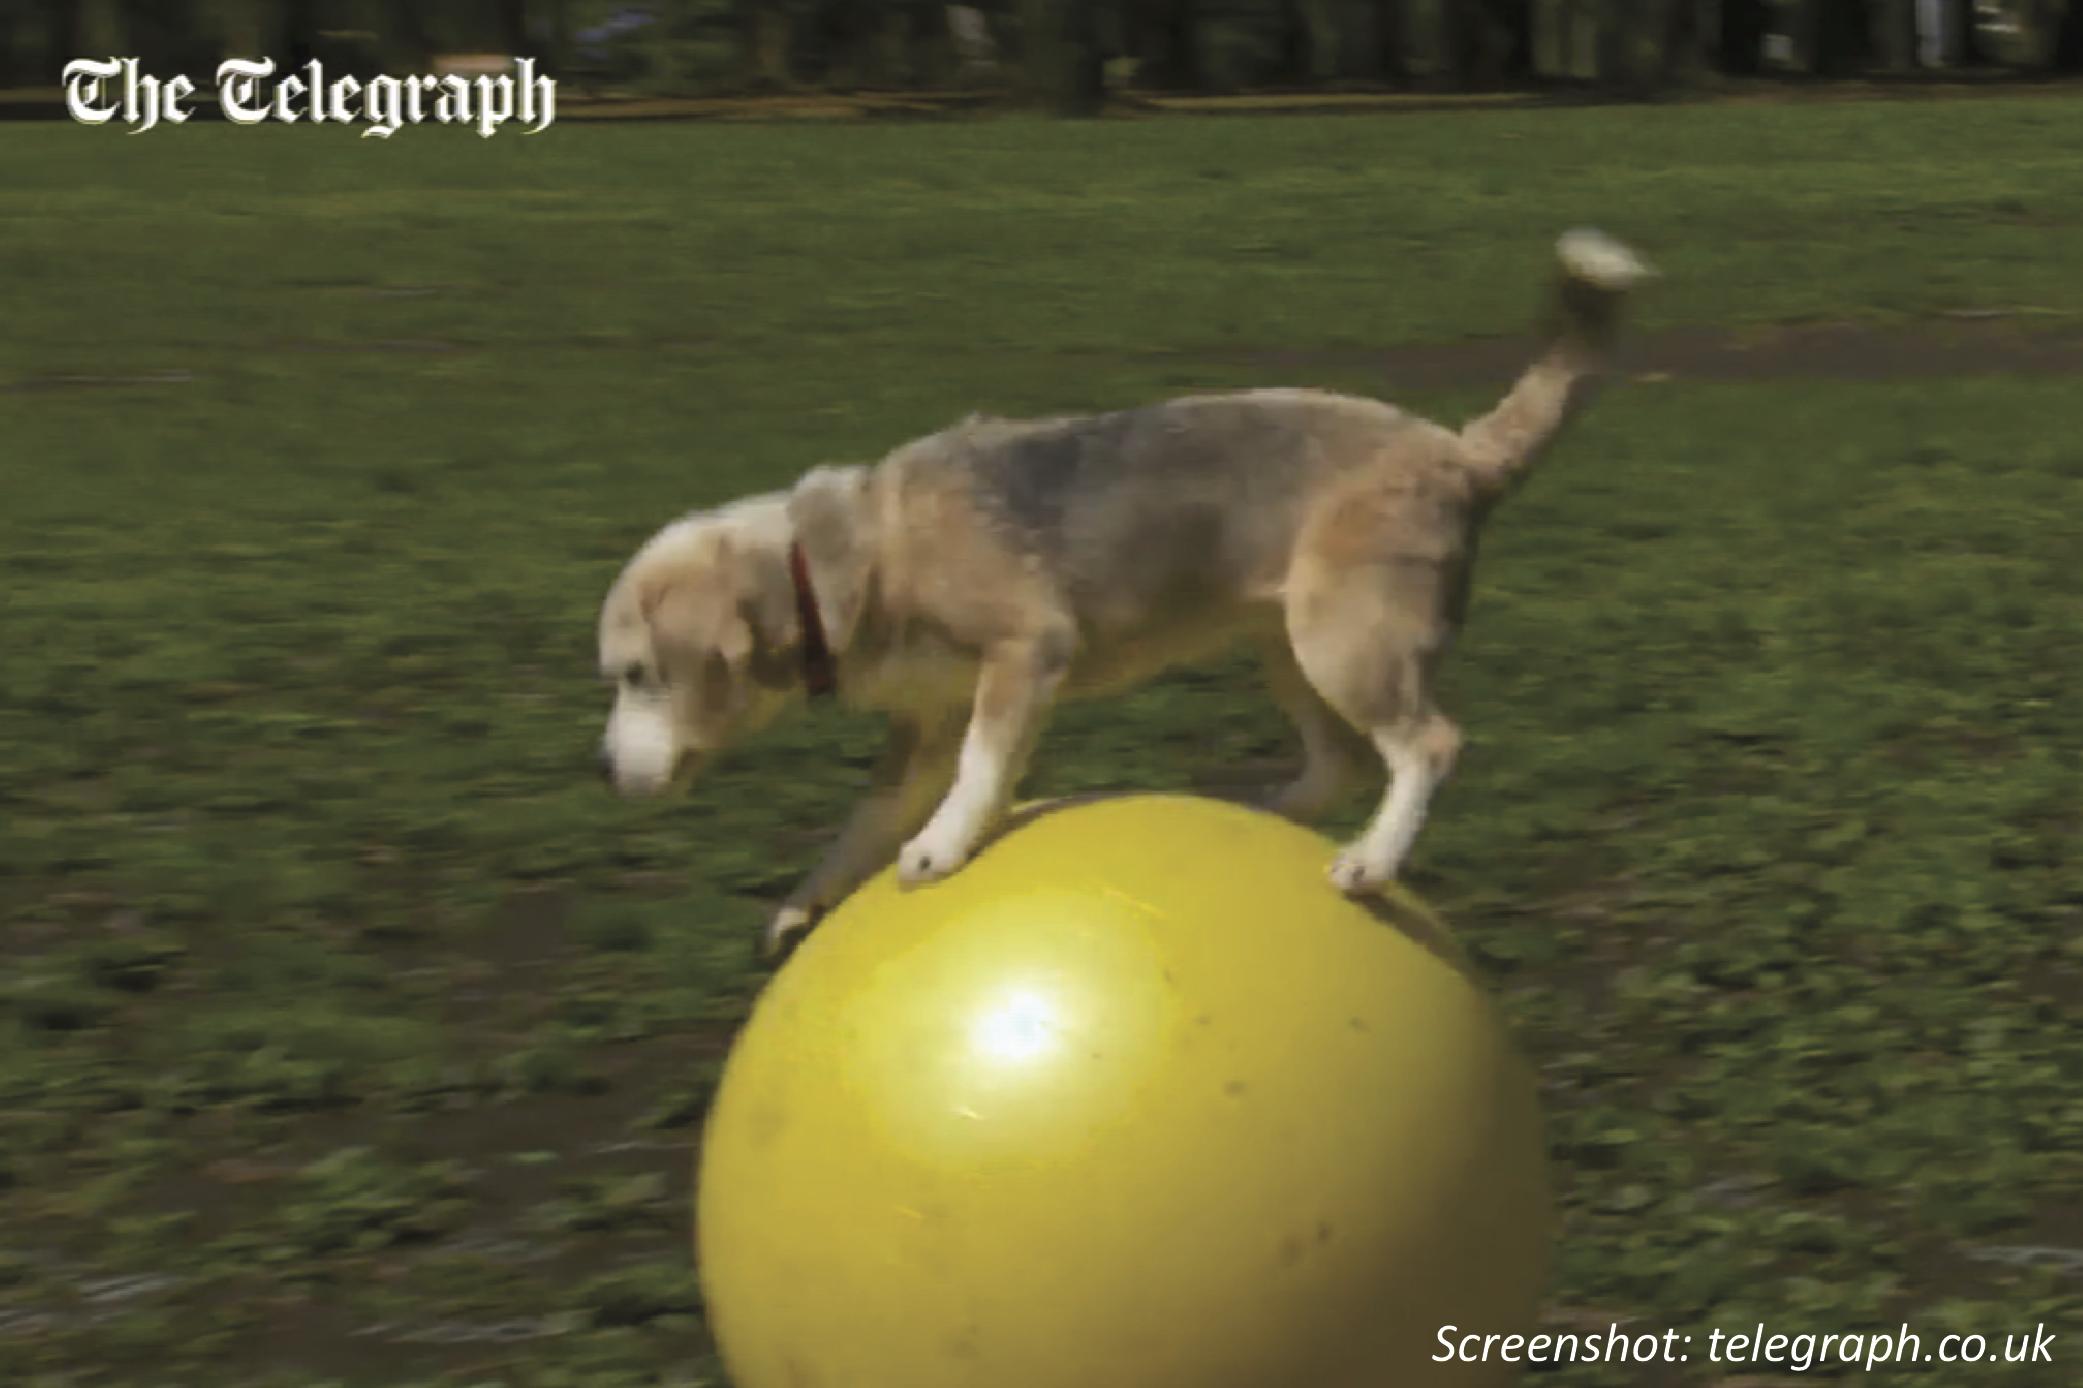 A Record-Breaking Beagle